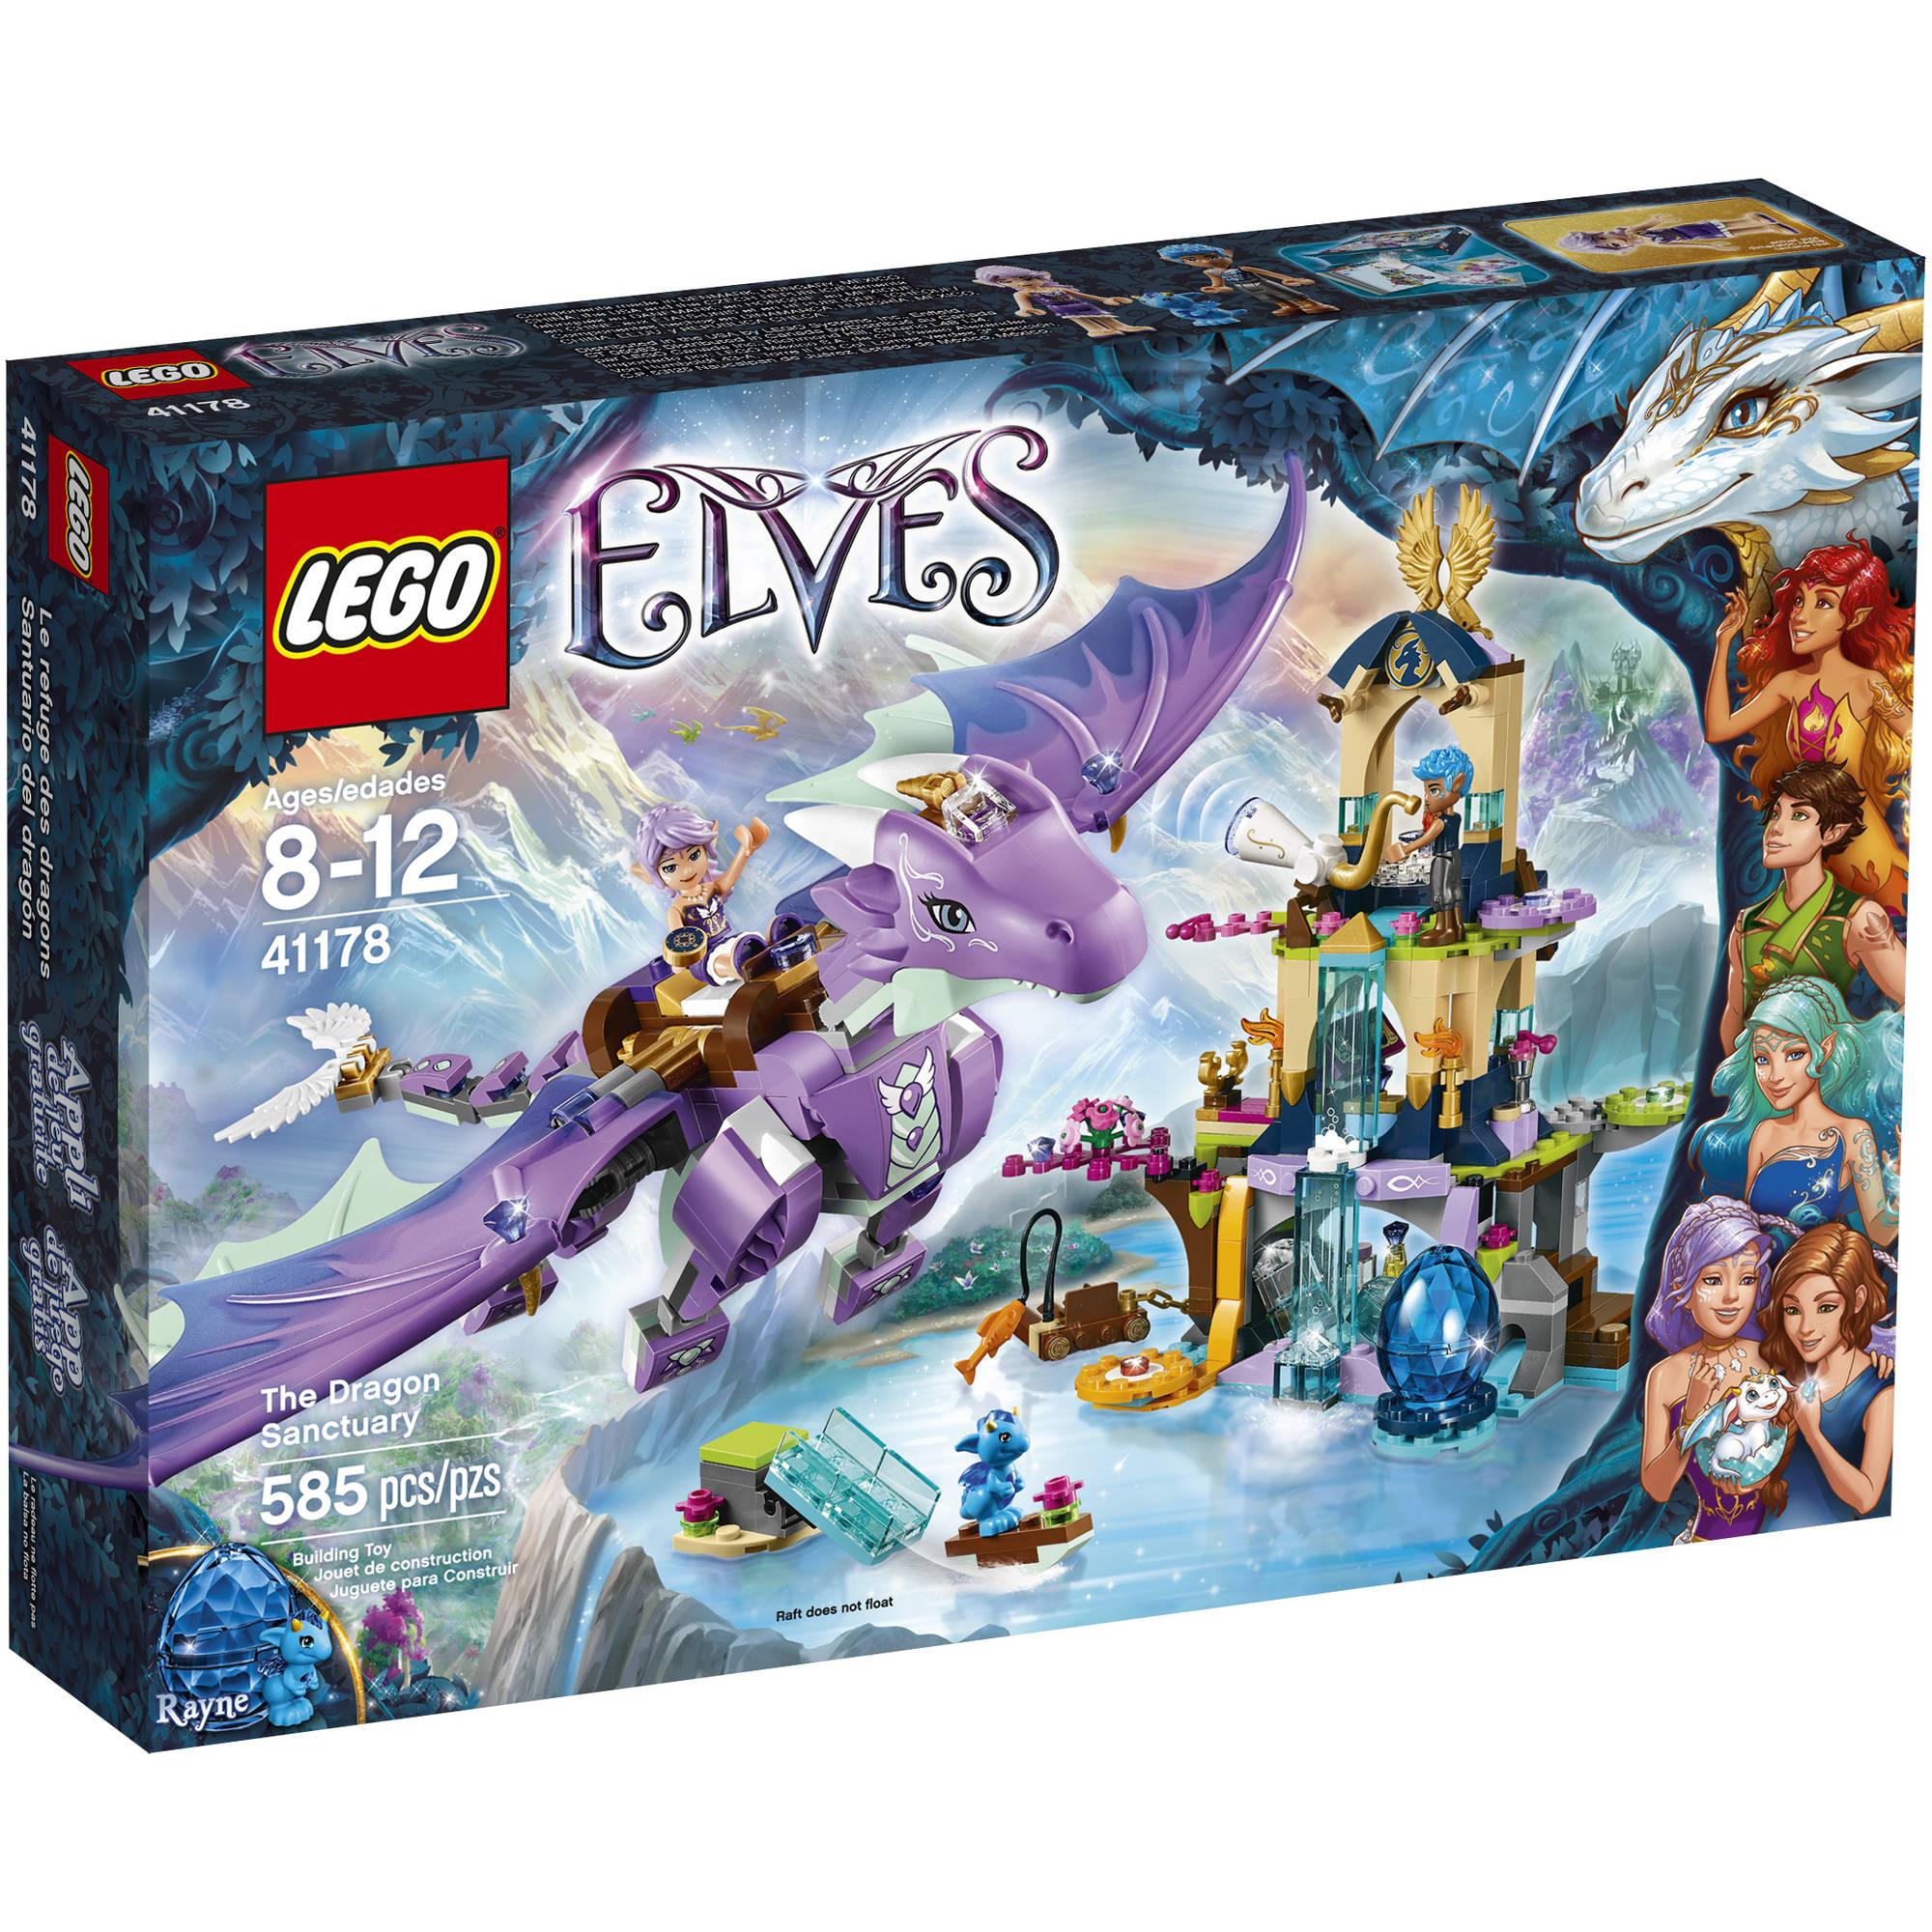 LEGO Elves The Dragon Sanctuary 41178 - Walmart.com